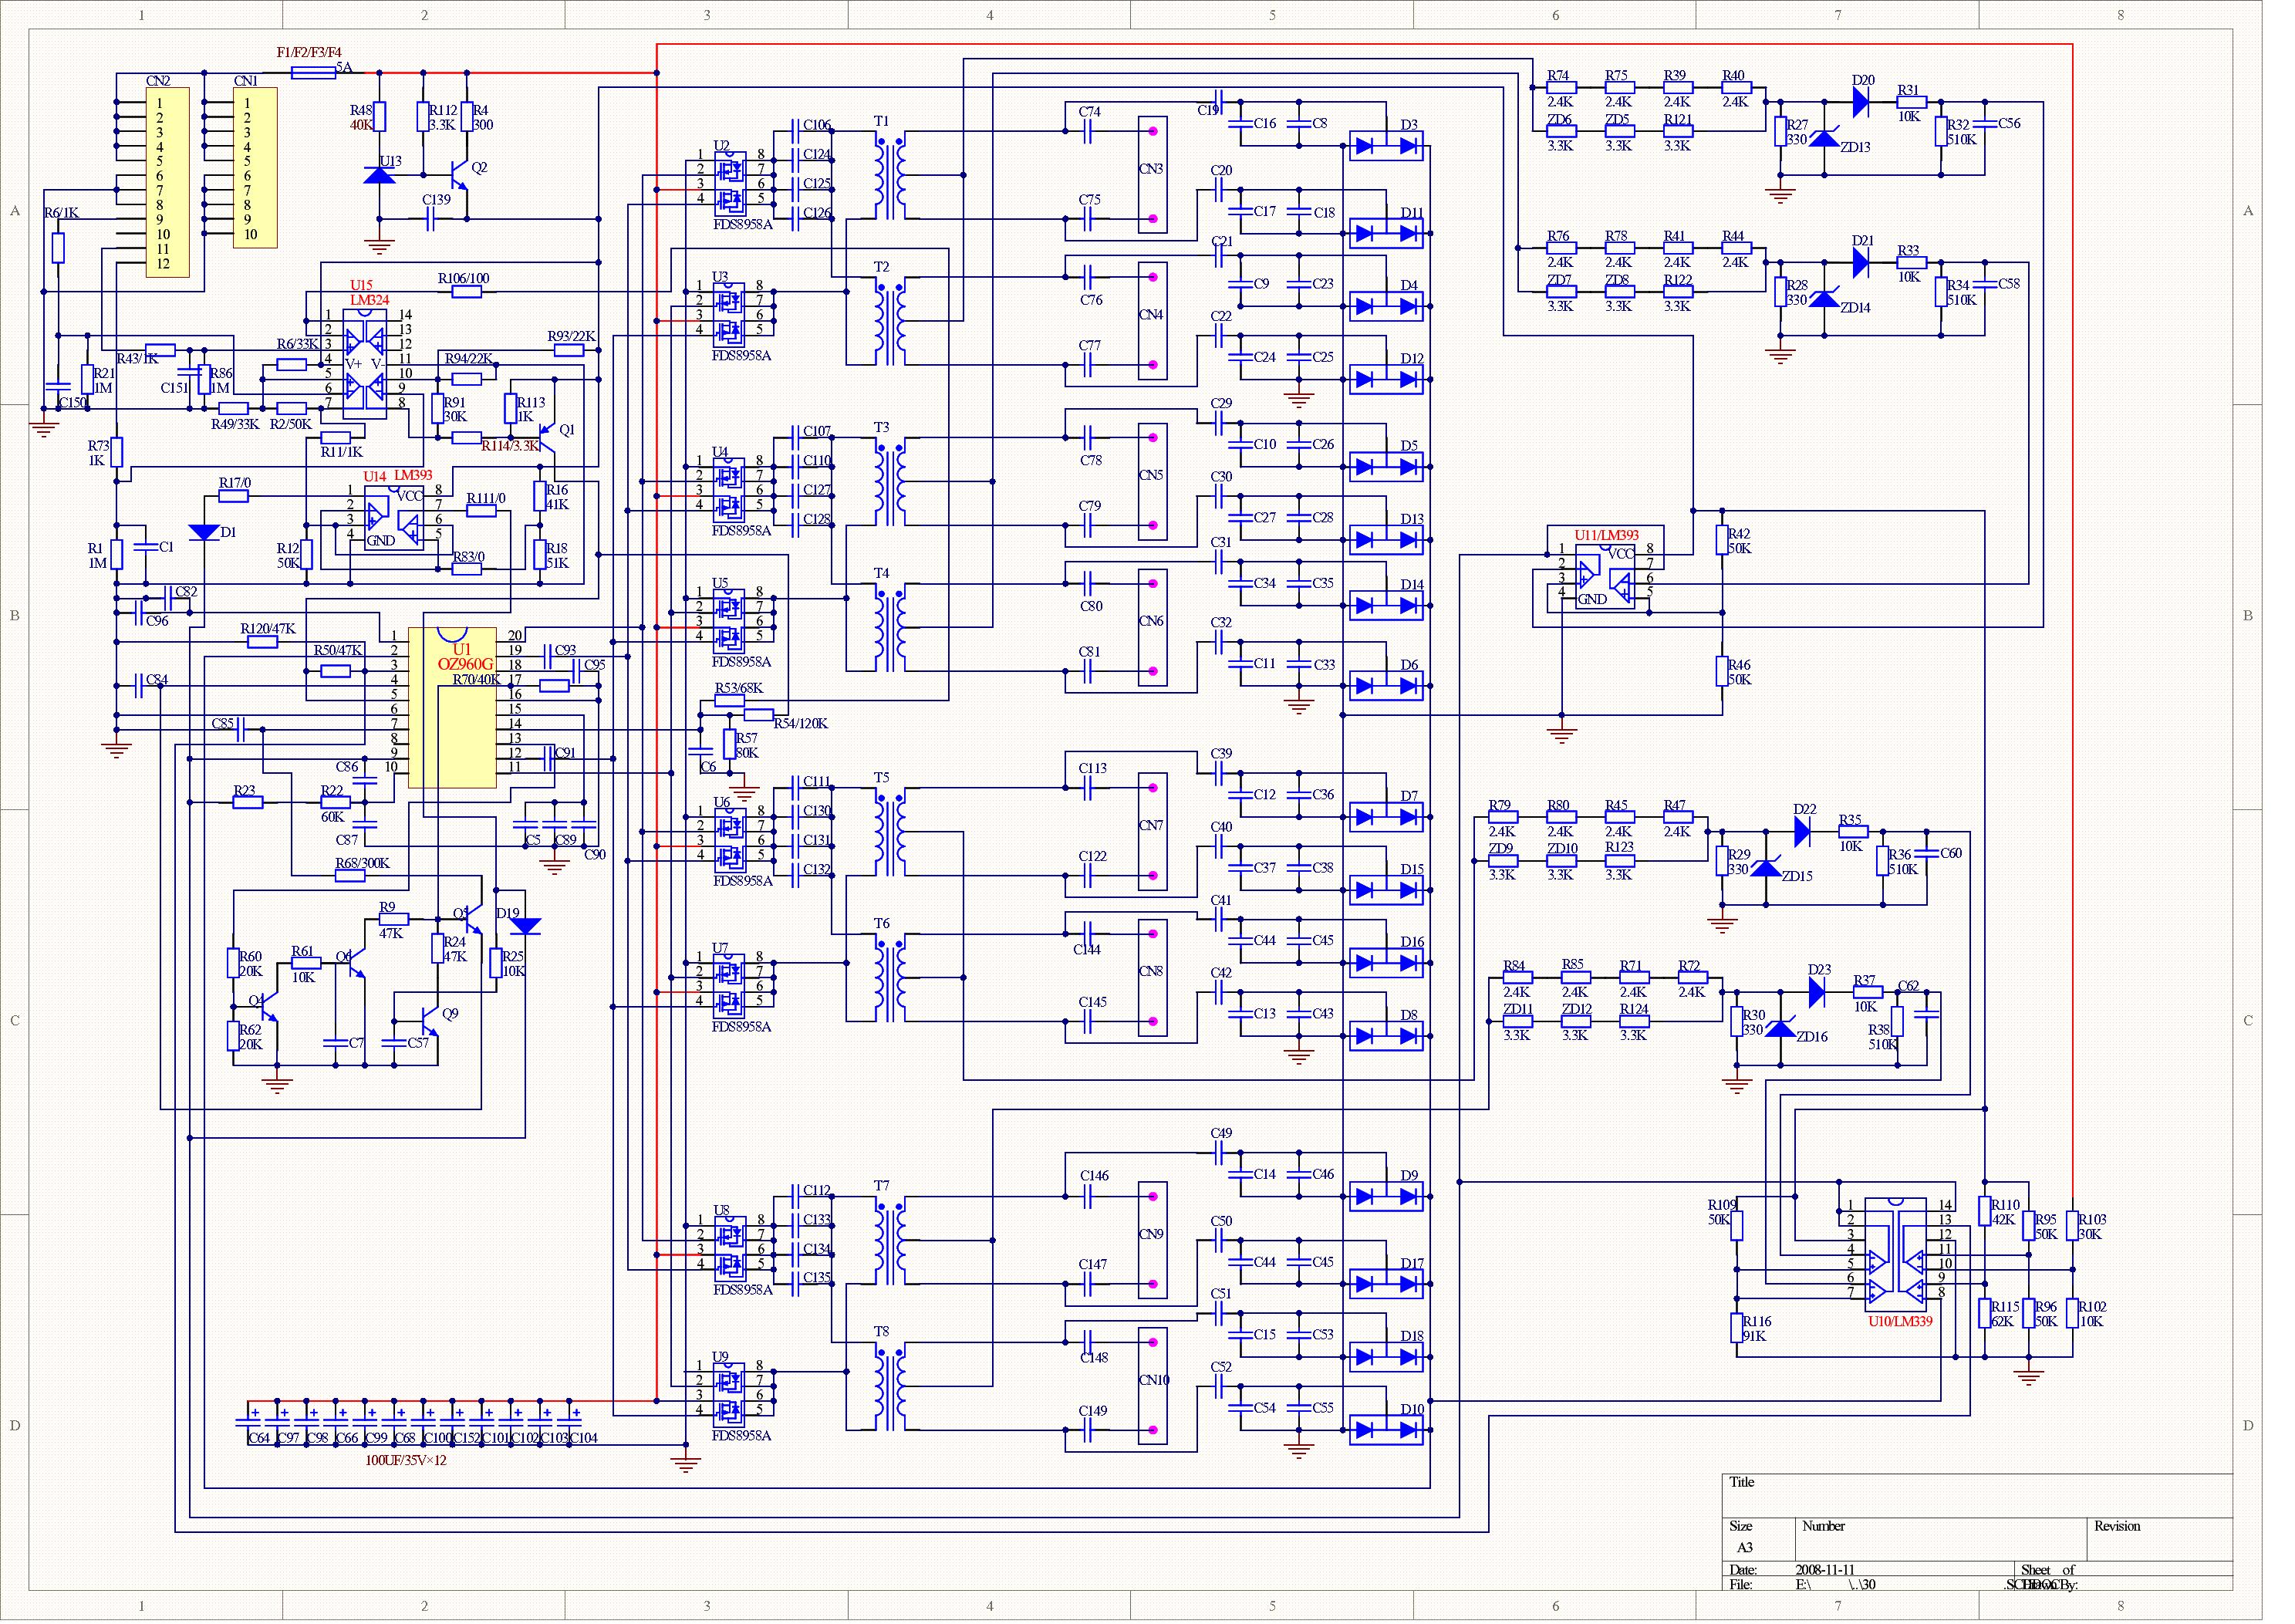 darfon v144 001 inverter oz960g lm324 lm393 fds8958a lm339 service rh elektrotanya com